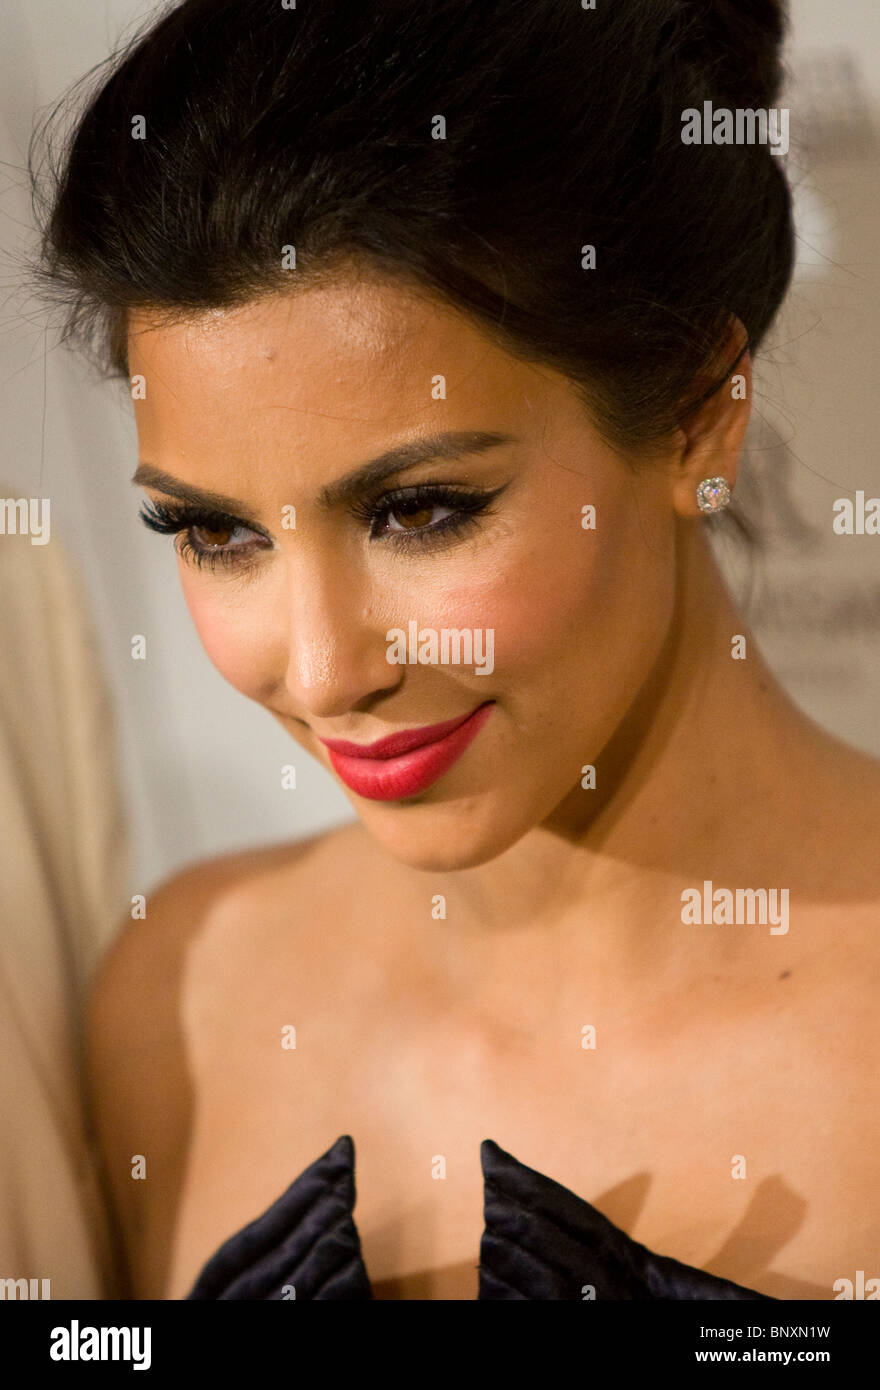 Kim Kardashian - Stock Image